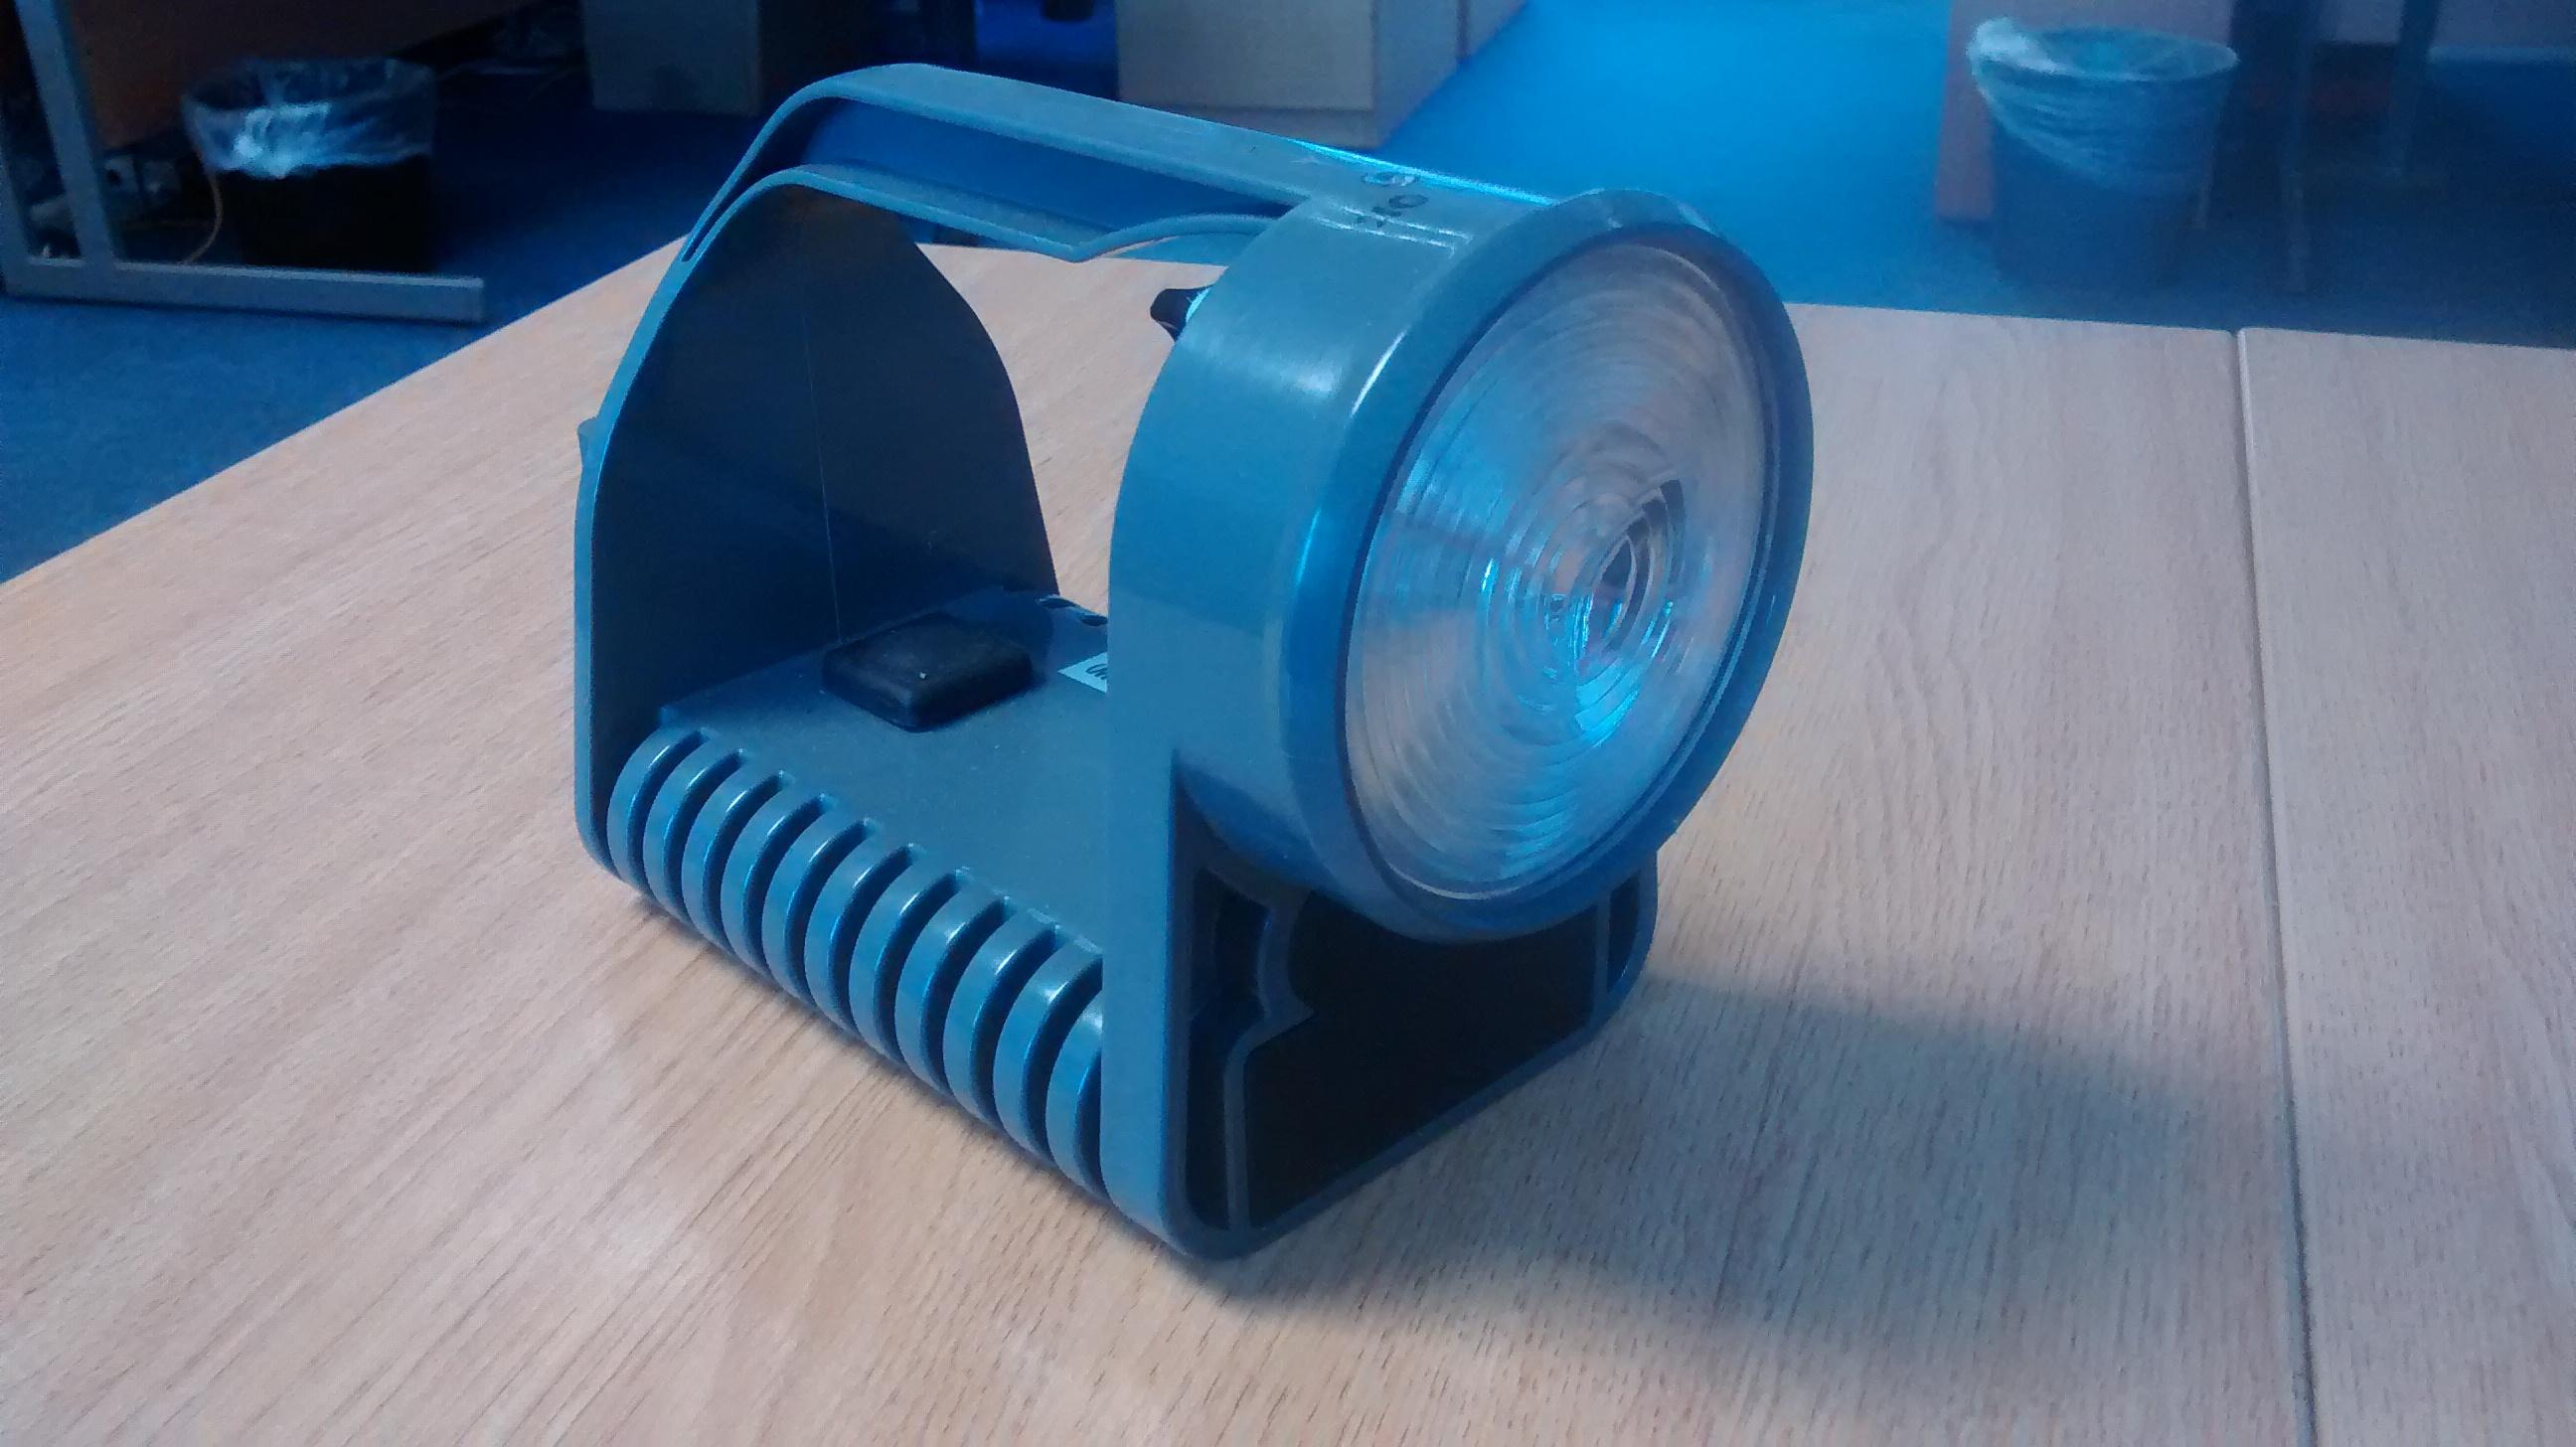 Rail Hand Lamp 3 Aspect Cat No: 0094/008052